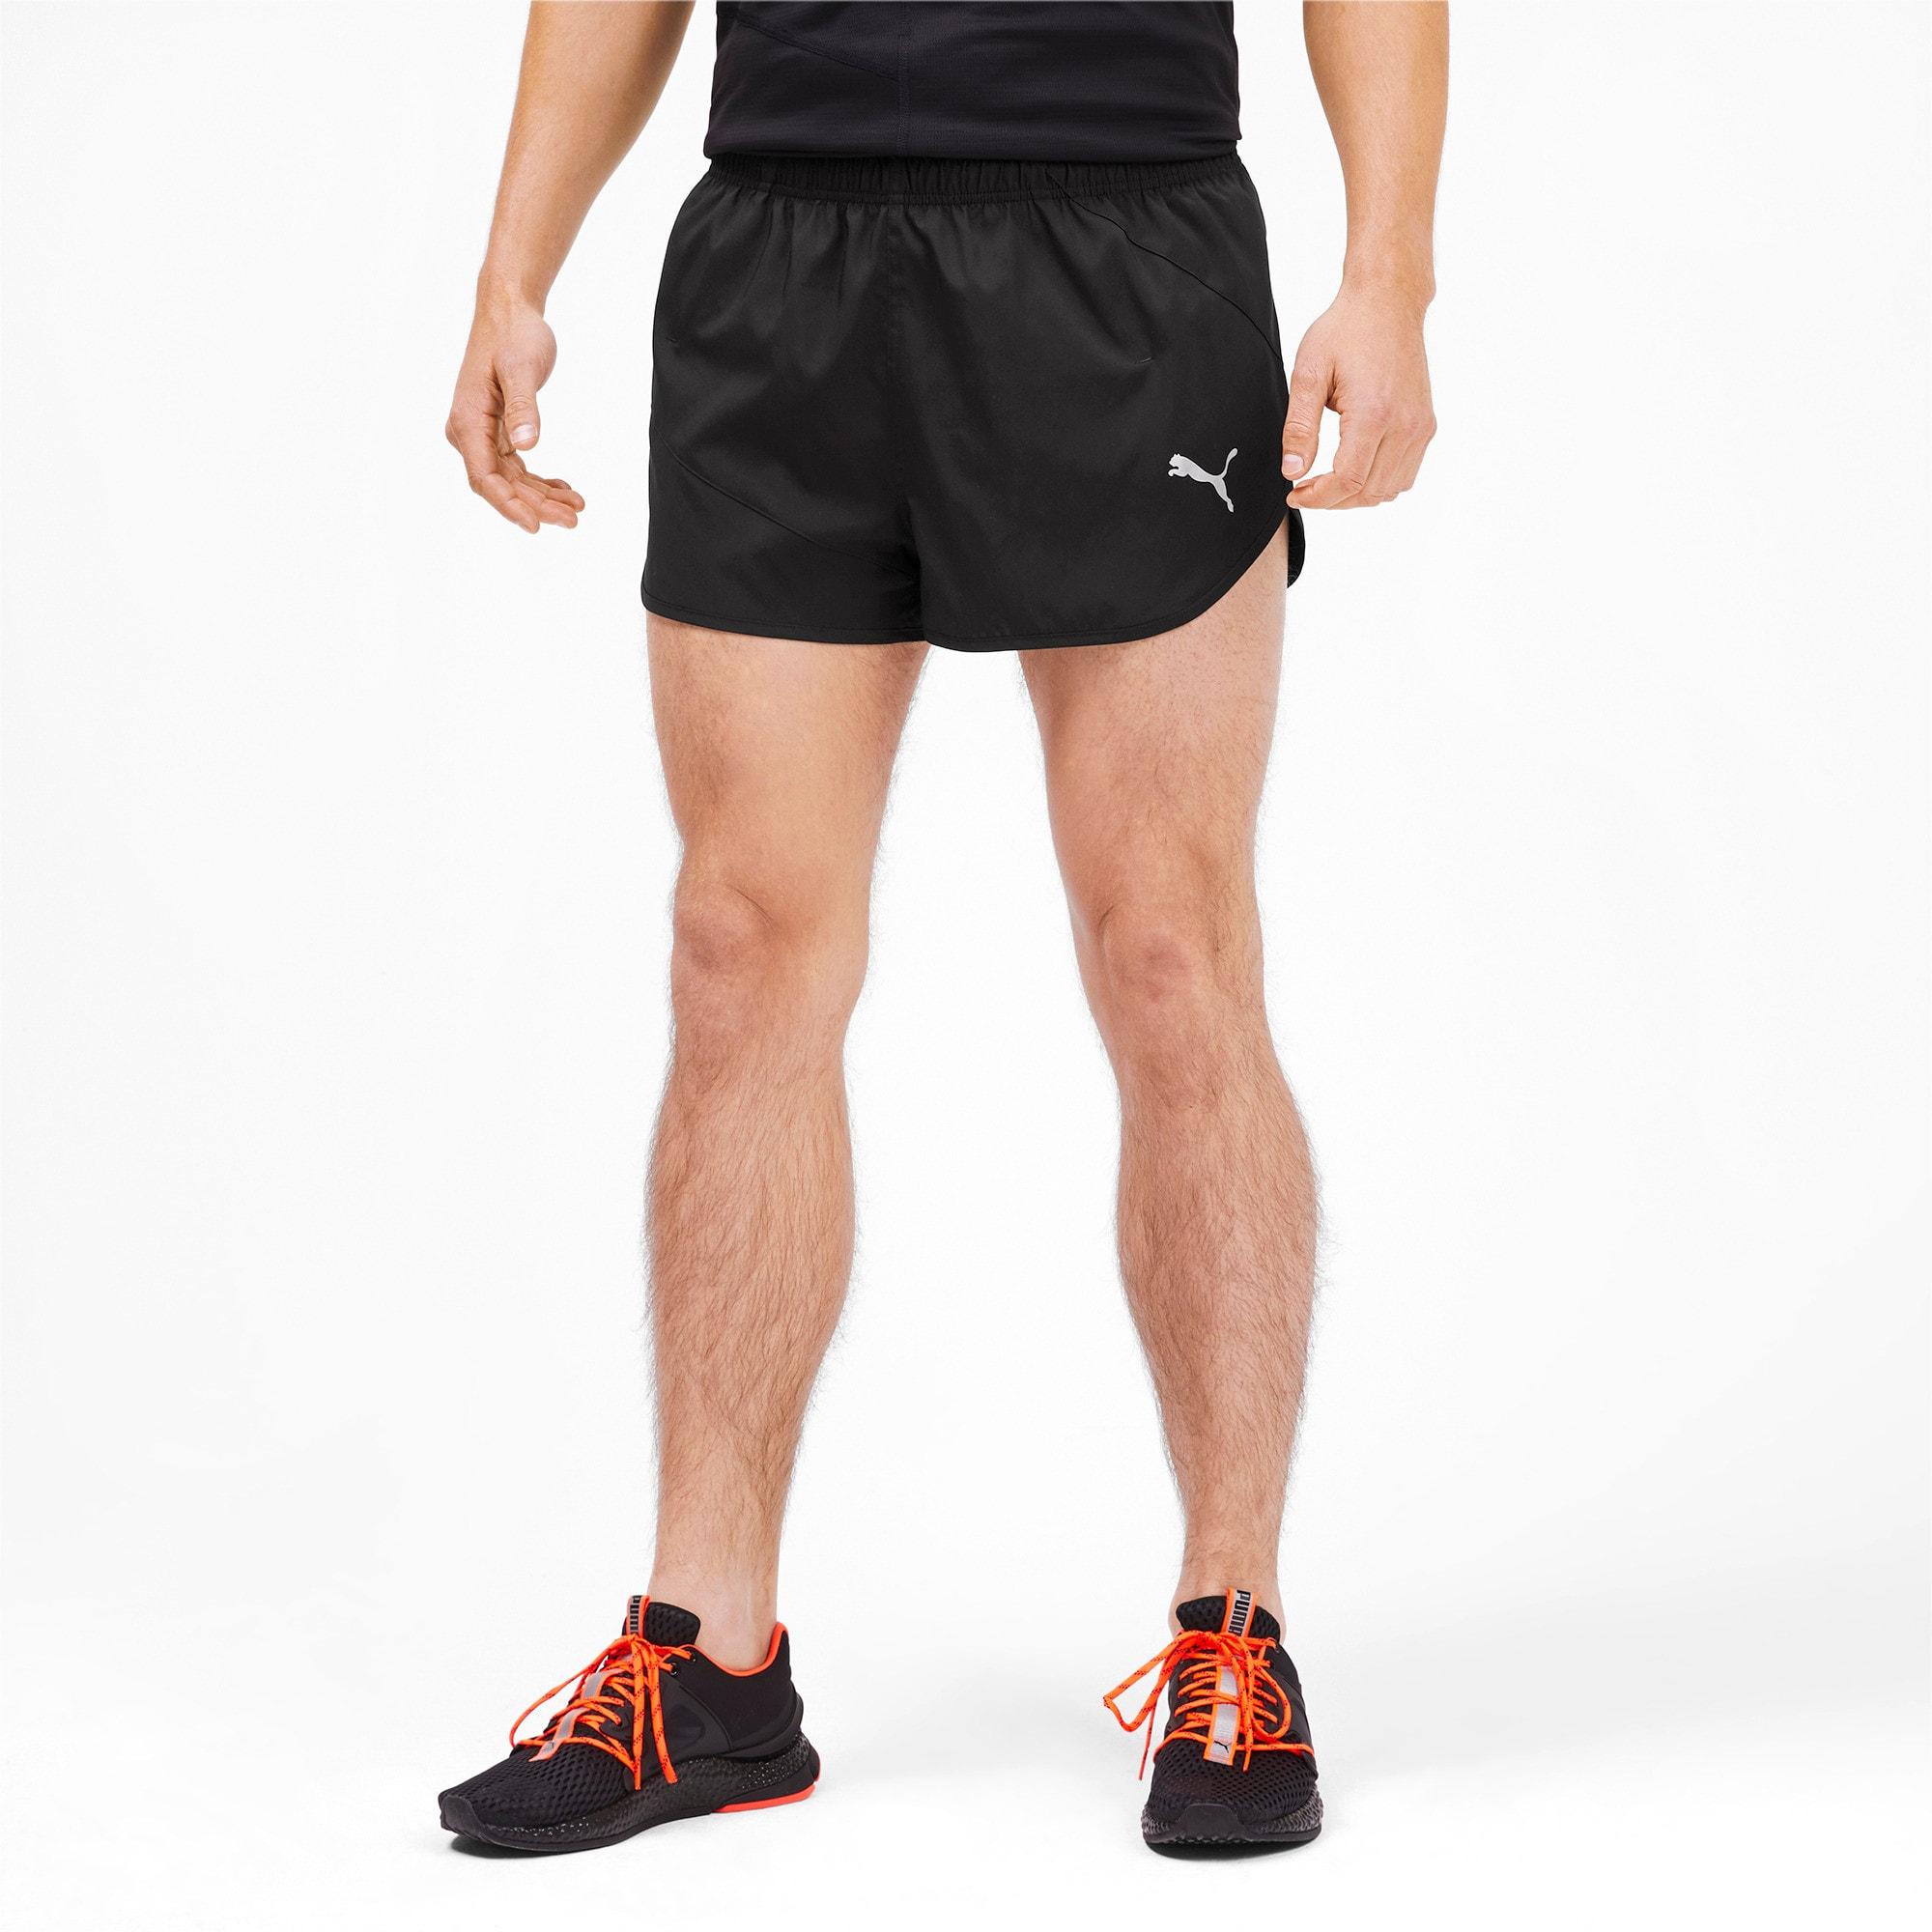 Thumbnail 1 of Ignite Men's Split Shorts, Puma Black, medium